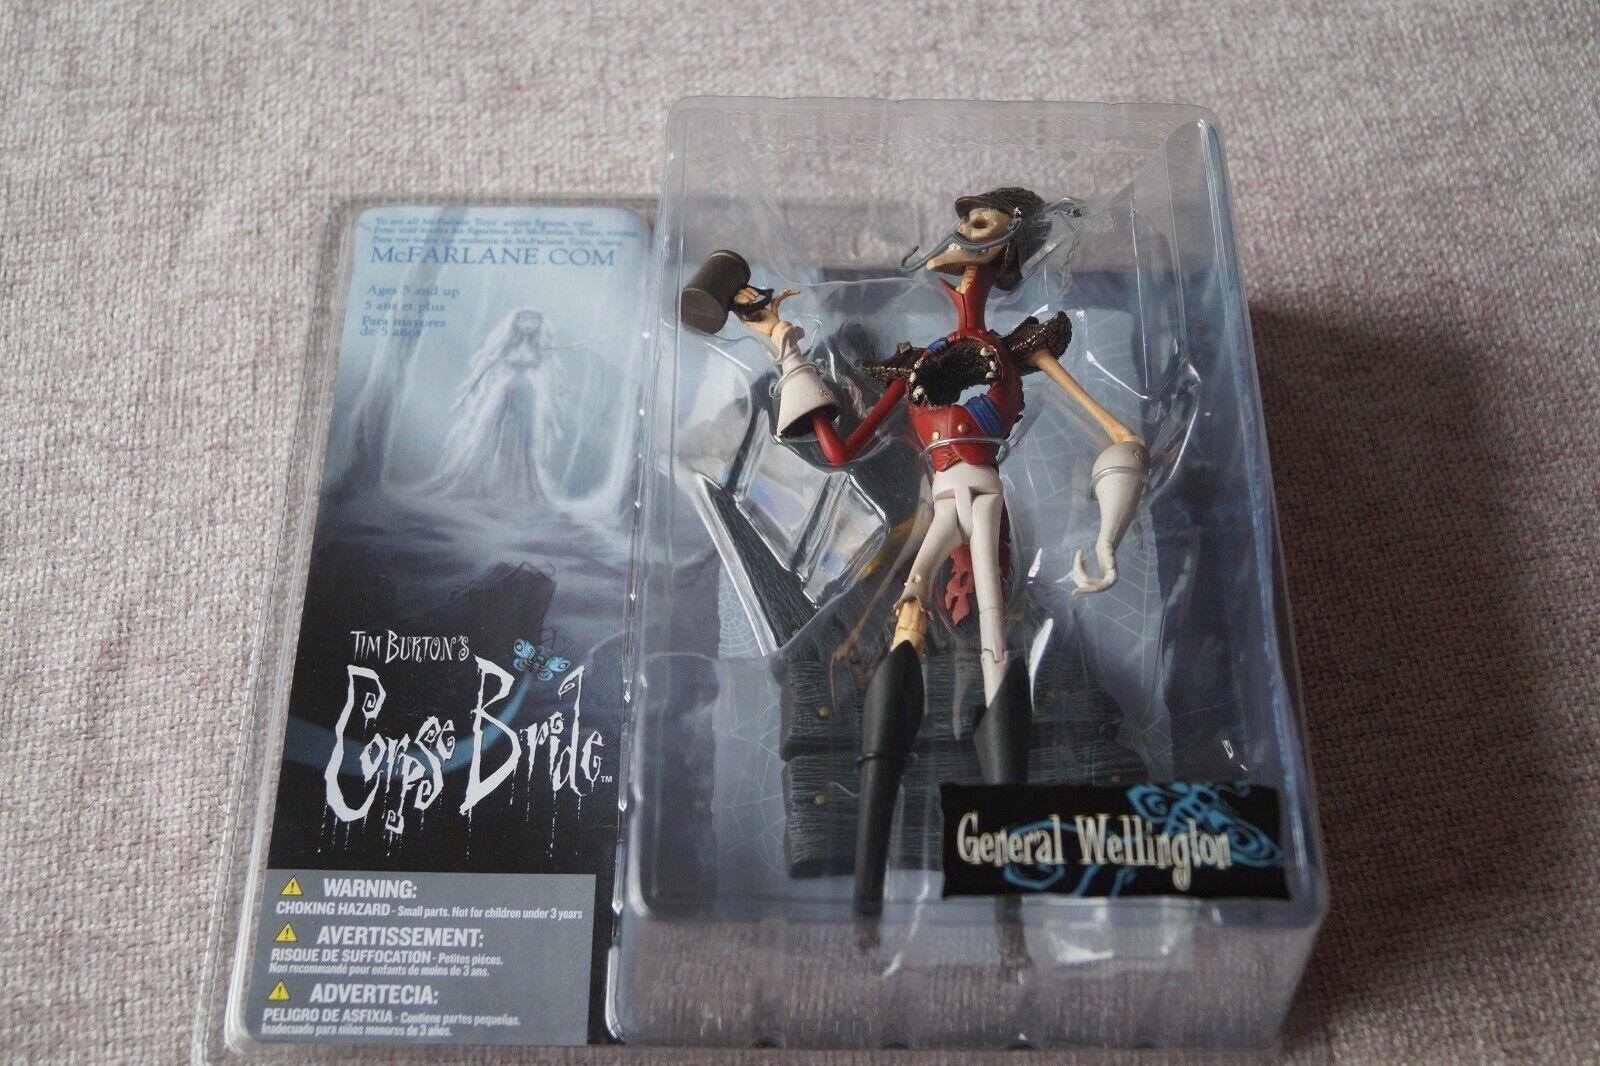 McFarlane Toys - Tim Burton's Corpse Bride - General Wellington Action Figure